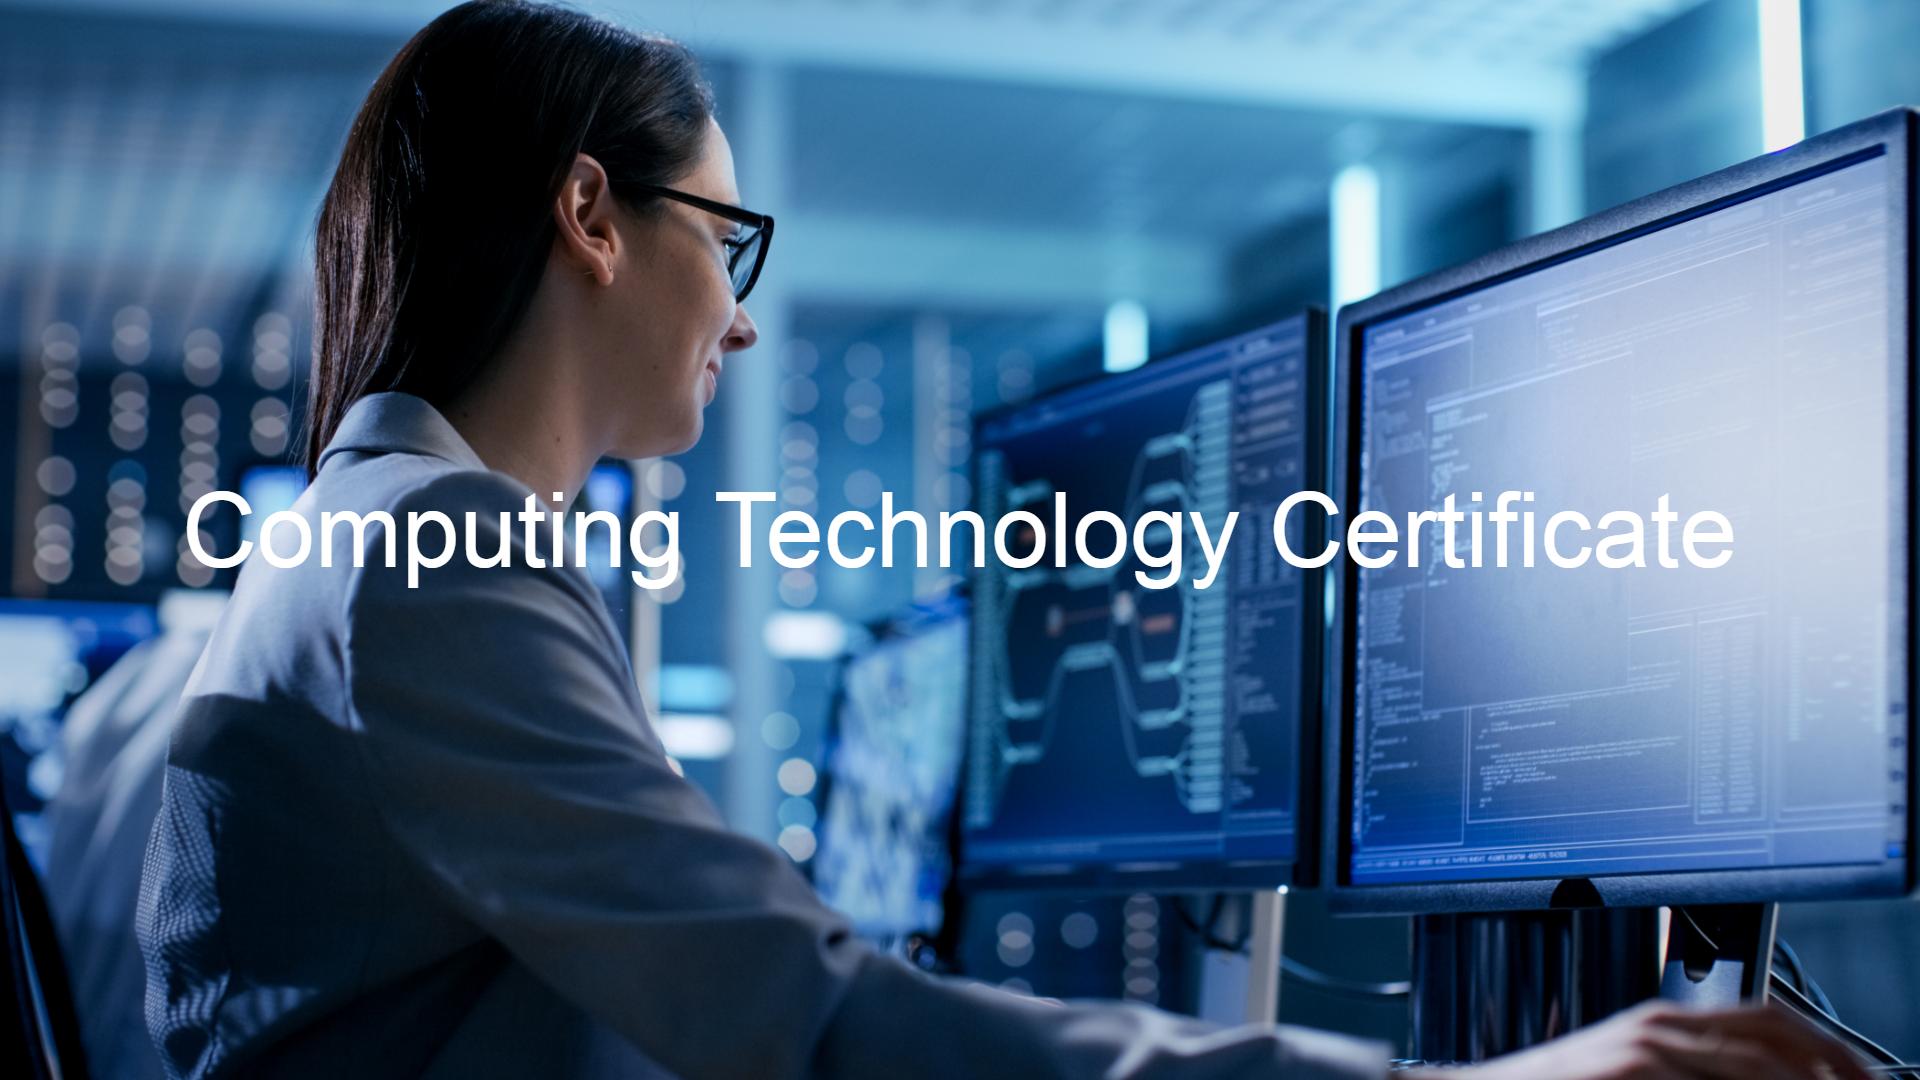 Montclair State University Computing Technology Certificate Program